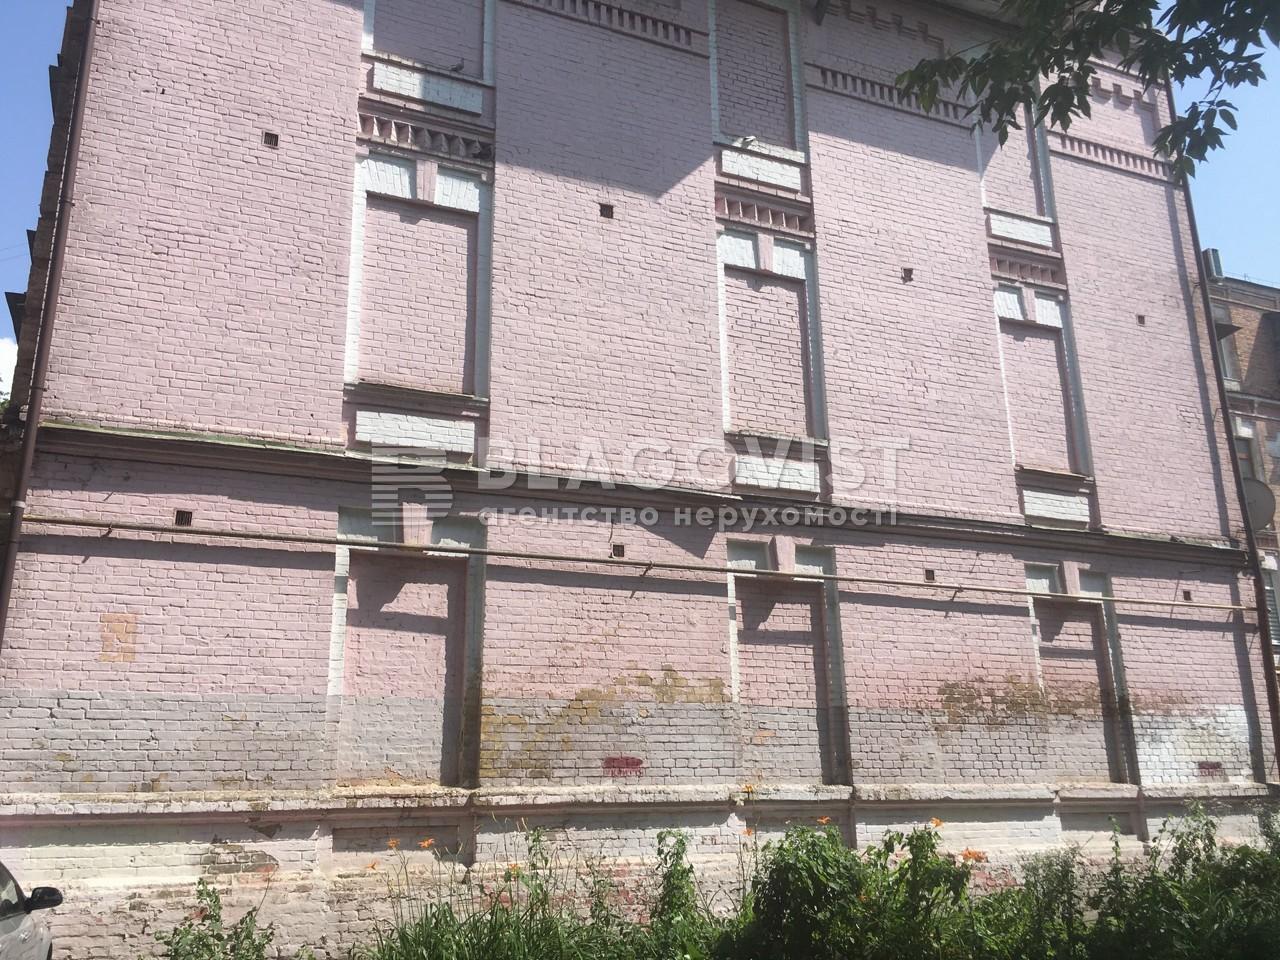 Квартира Z-793293, Горской Алллы пер. (Белинского Чеслава пер.), 8, Киев - Фото 11